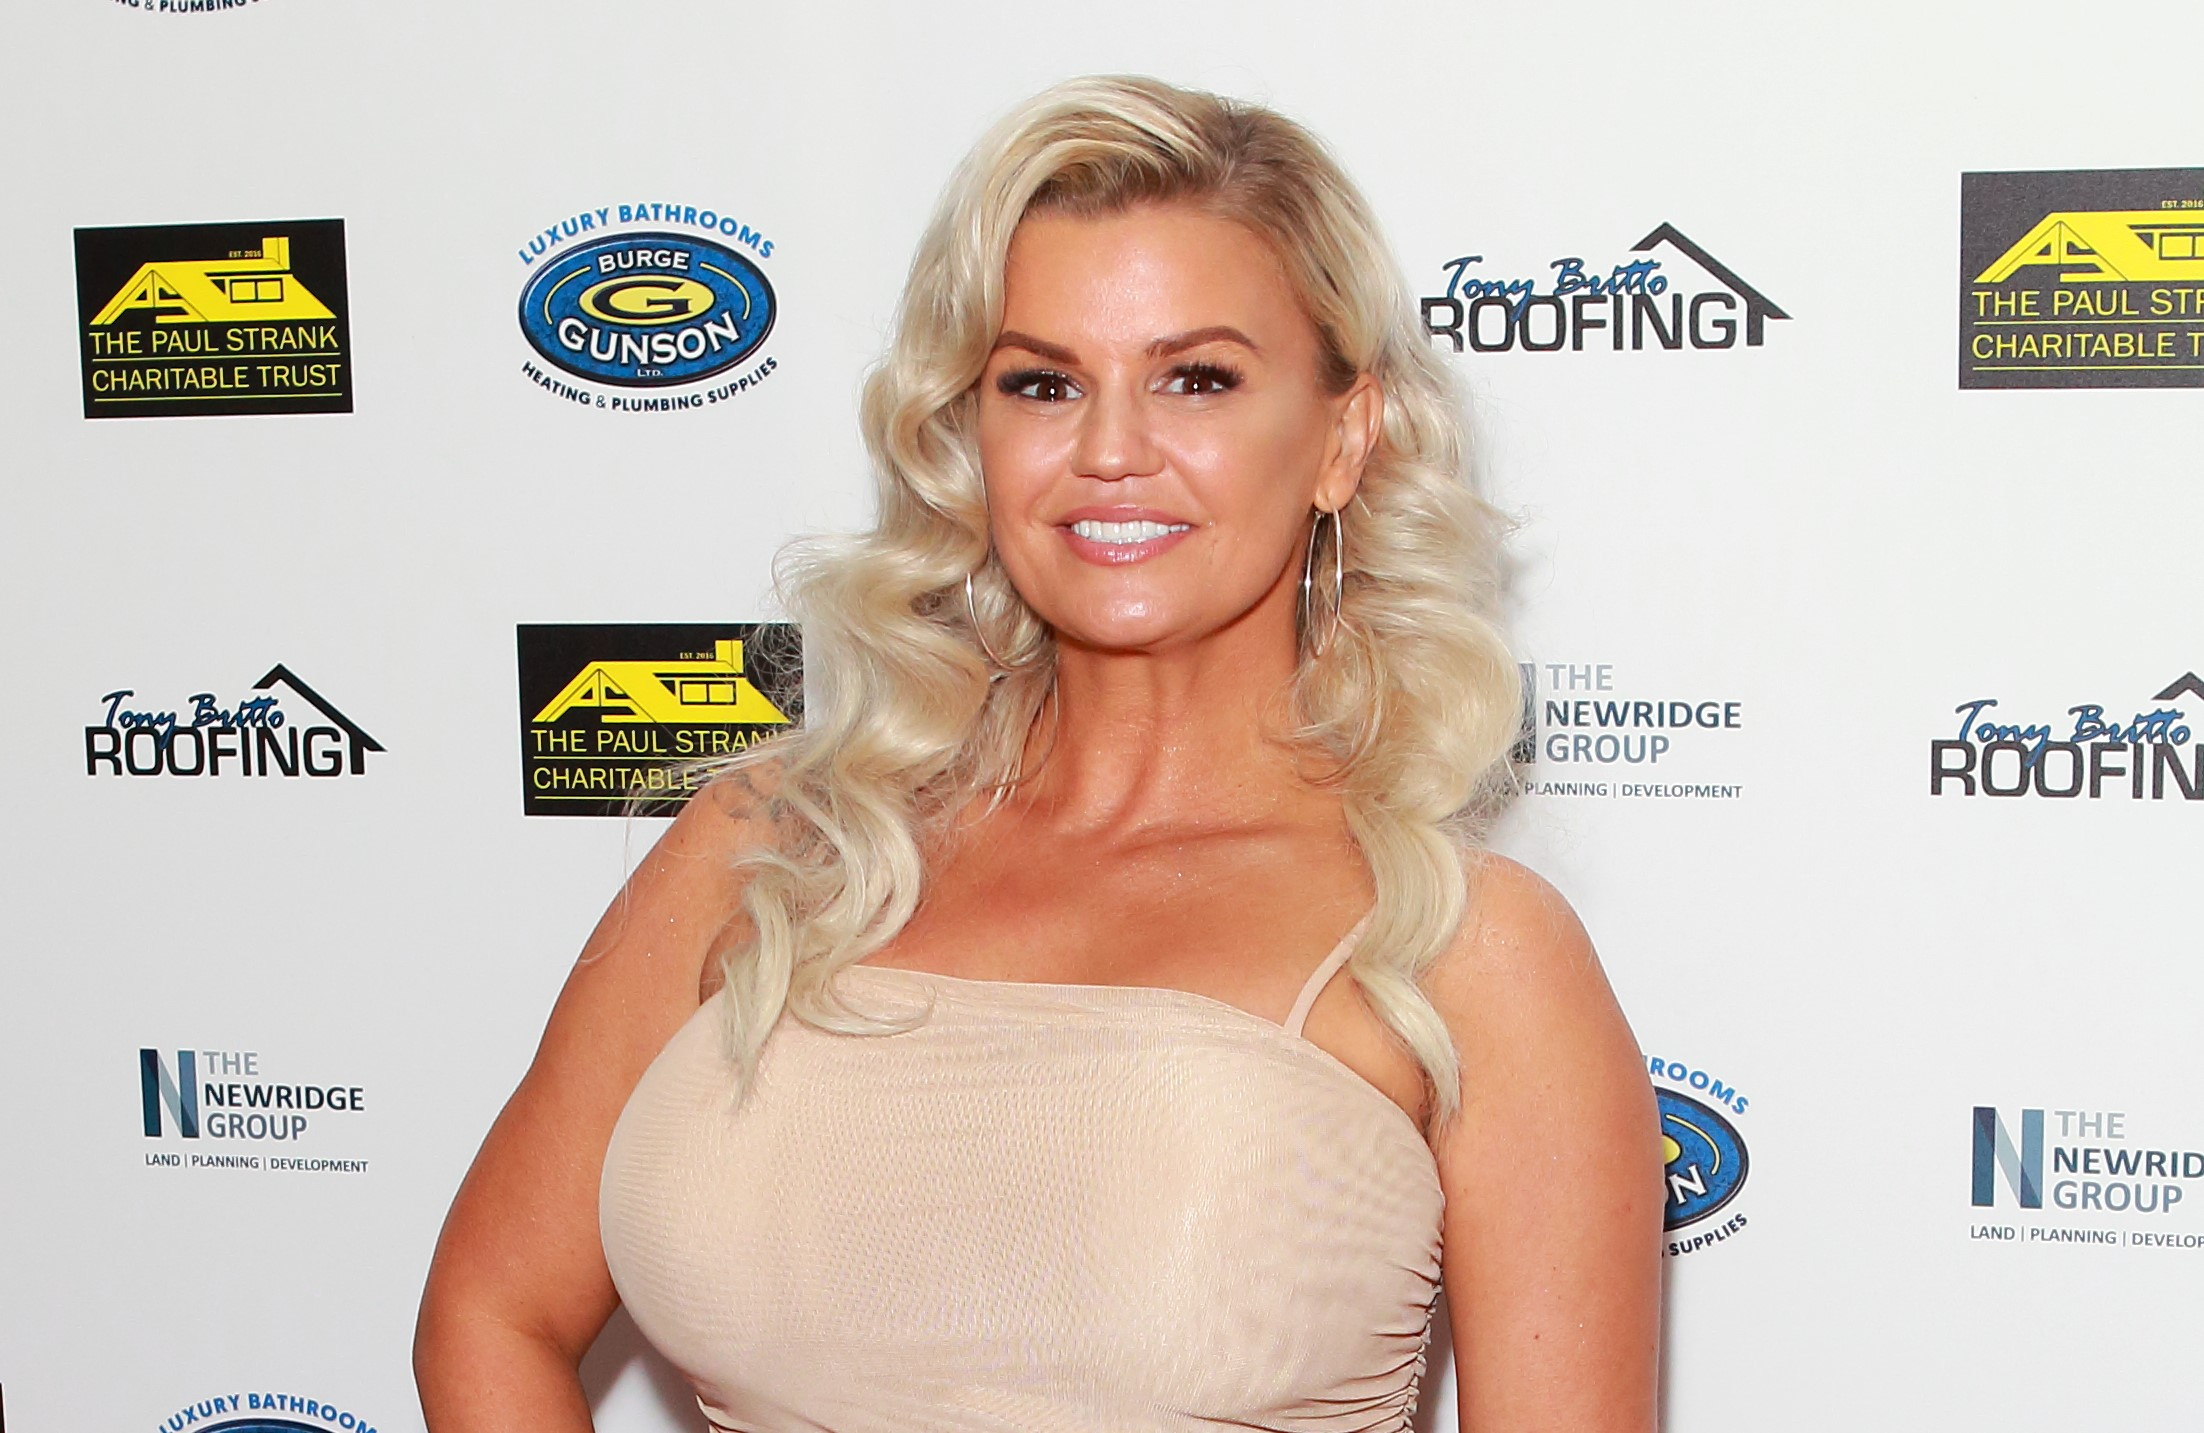 Kerry Katona claims Katie Price 'was picked on' during Celebrity SAS: Who Dares Wins